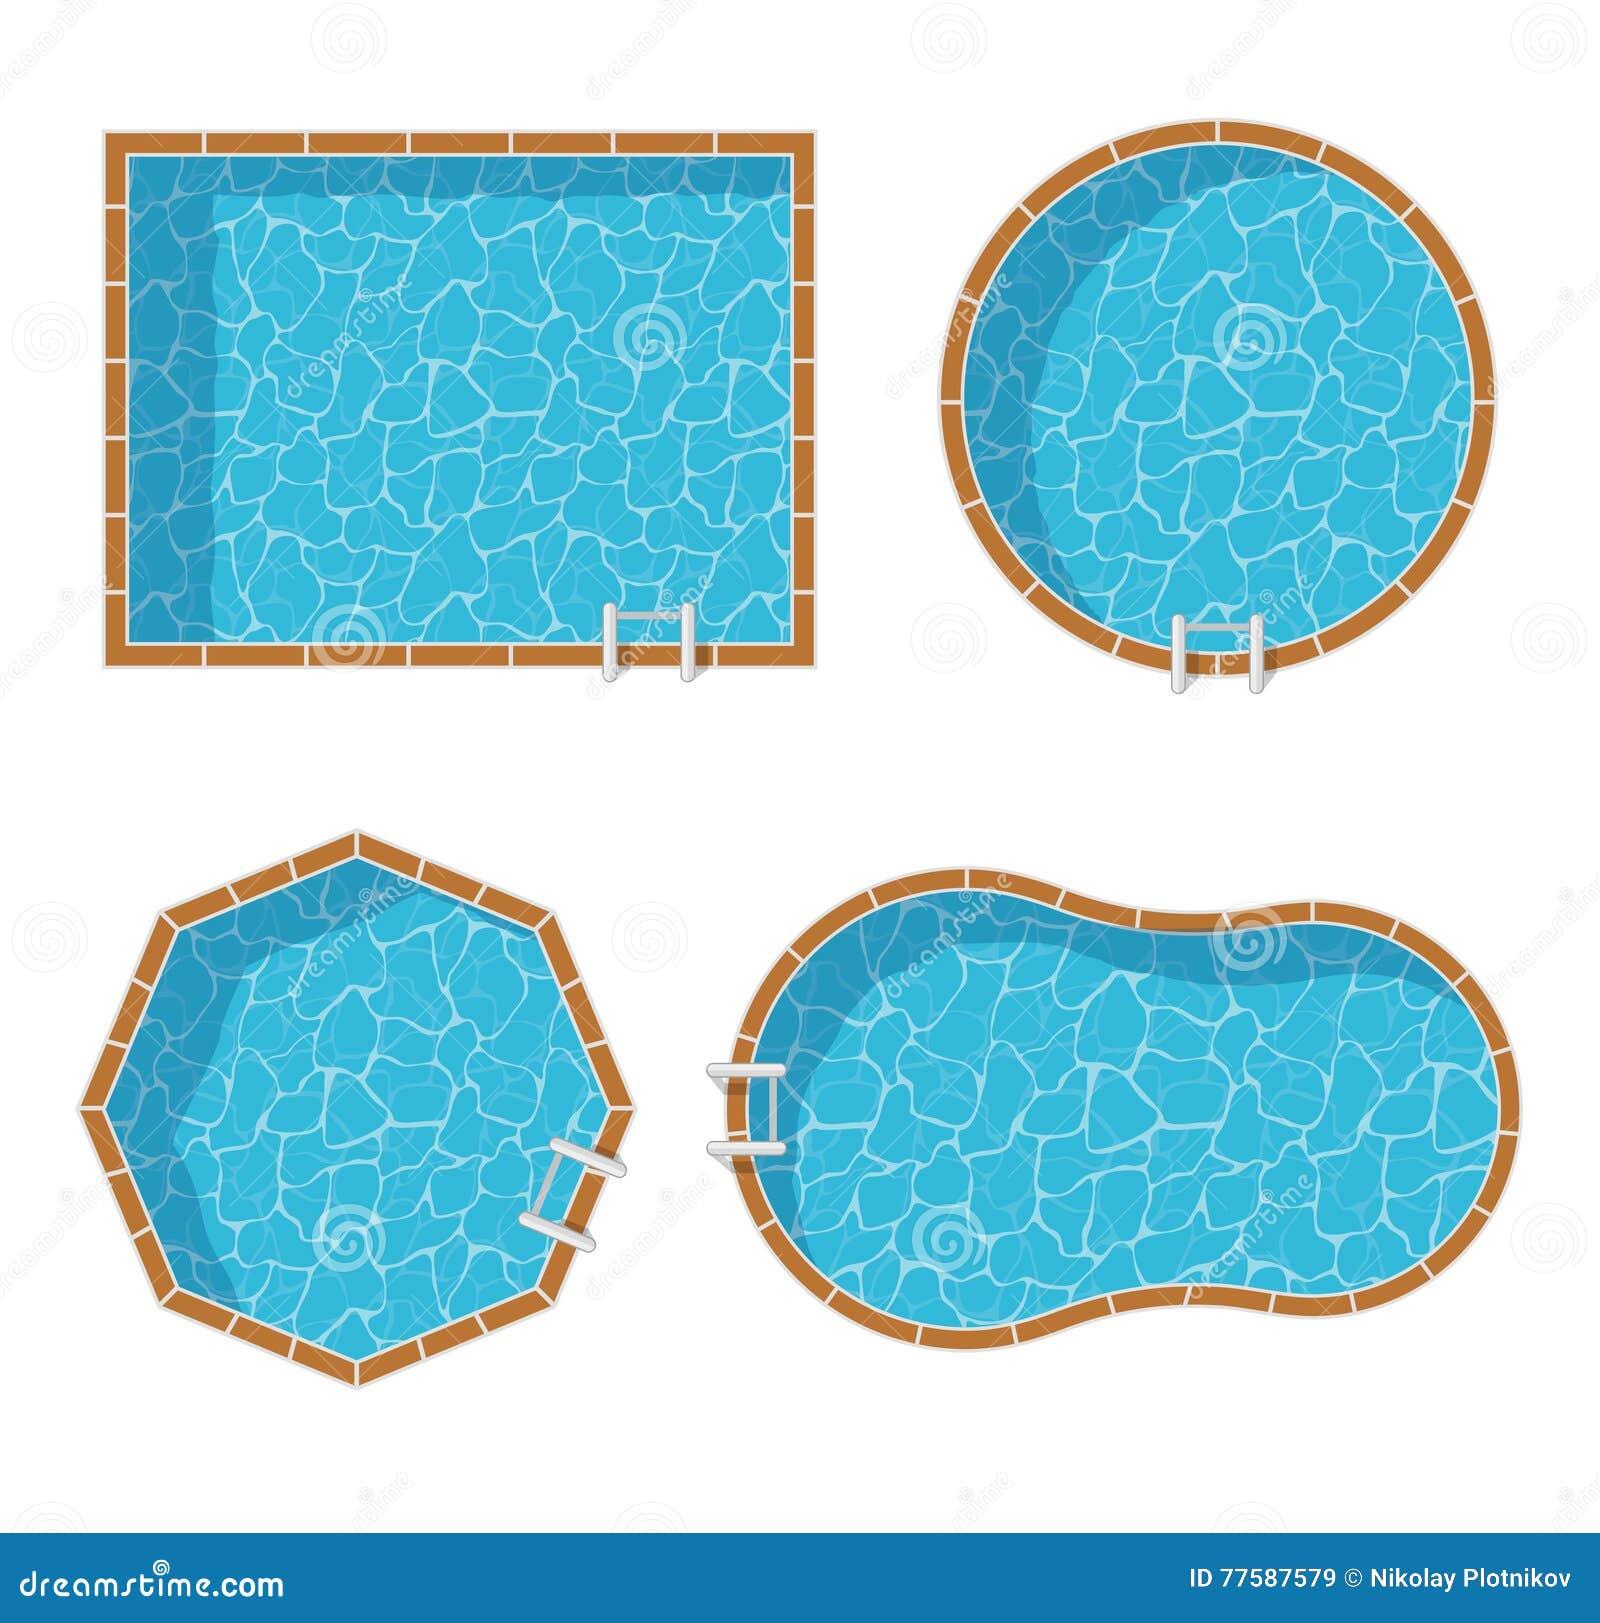 Underwater Palace Cartoon Vector Cartoondealer Com 48125497